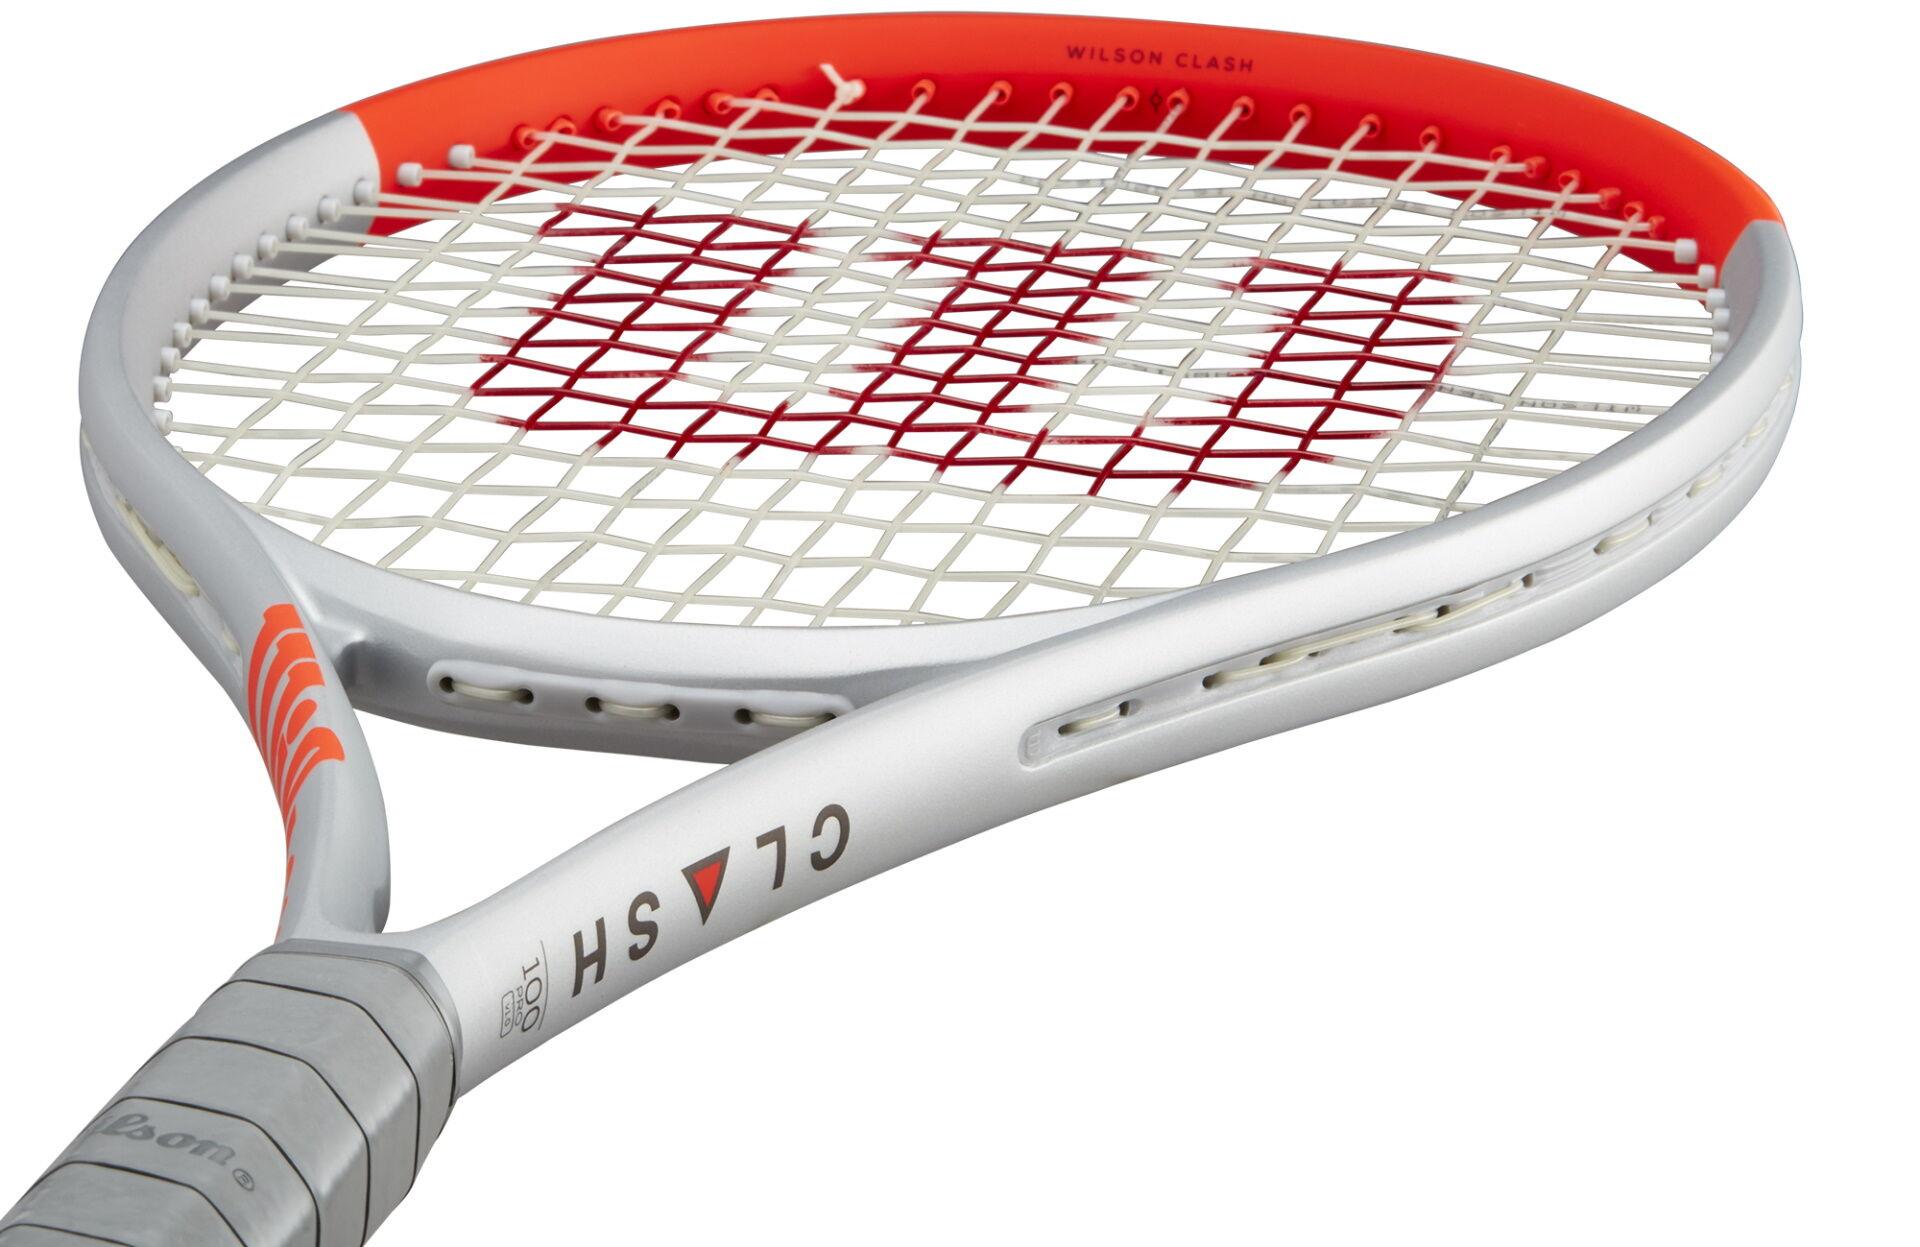 Wilson Clash 100 Pro Silver teniszütő